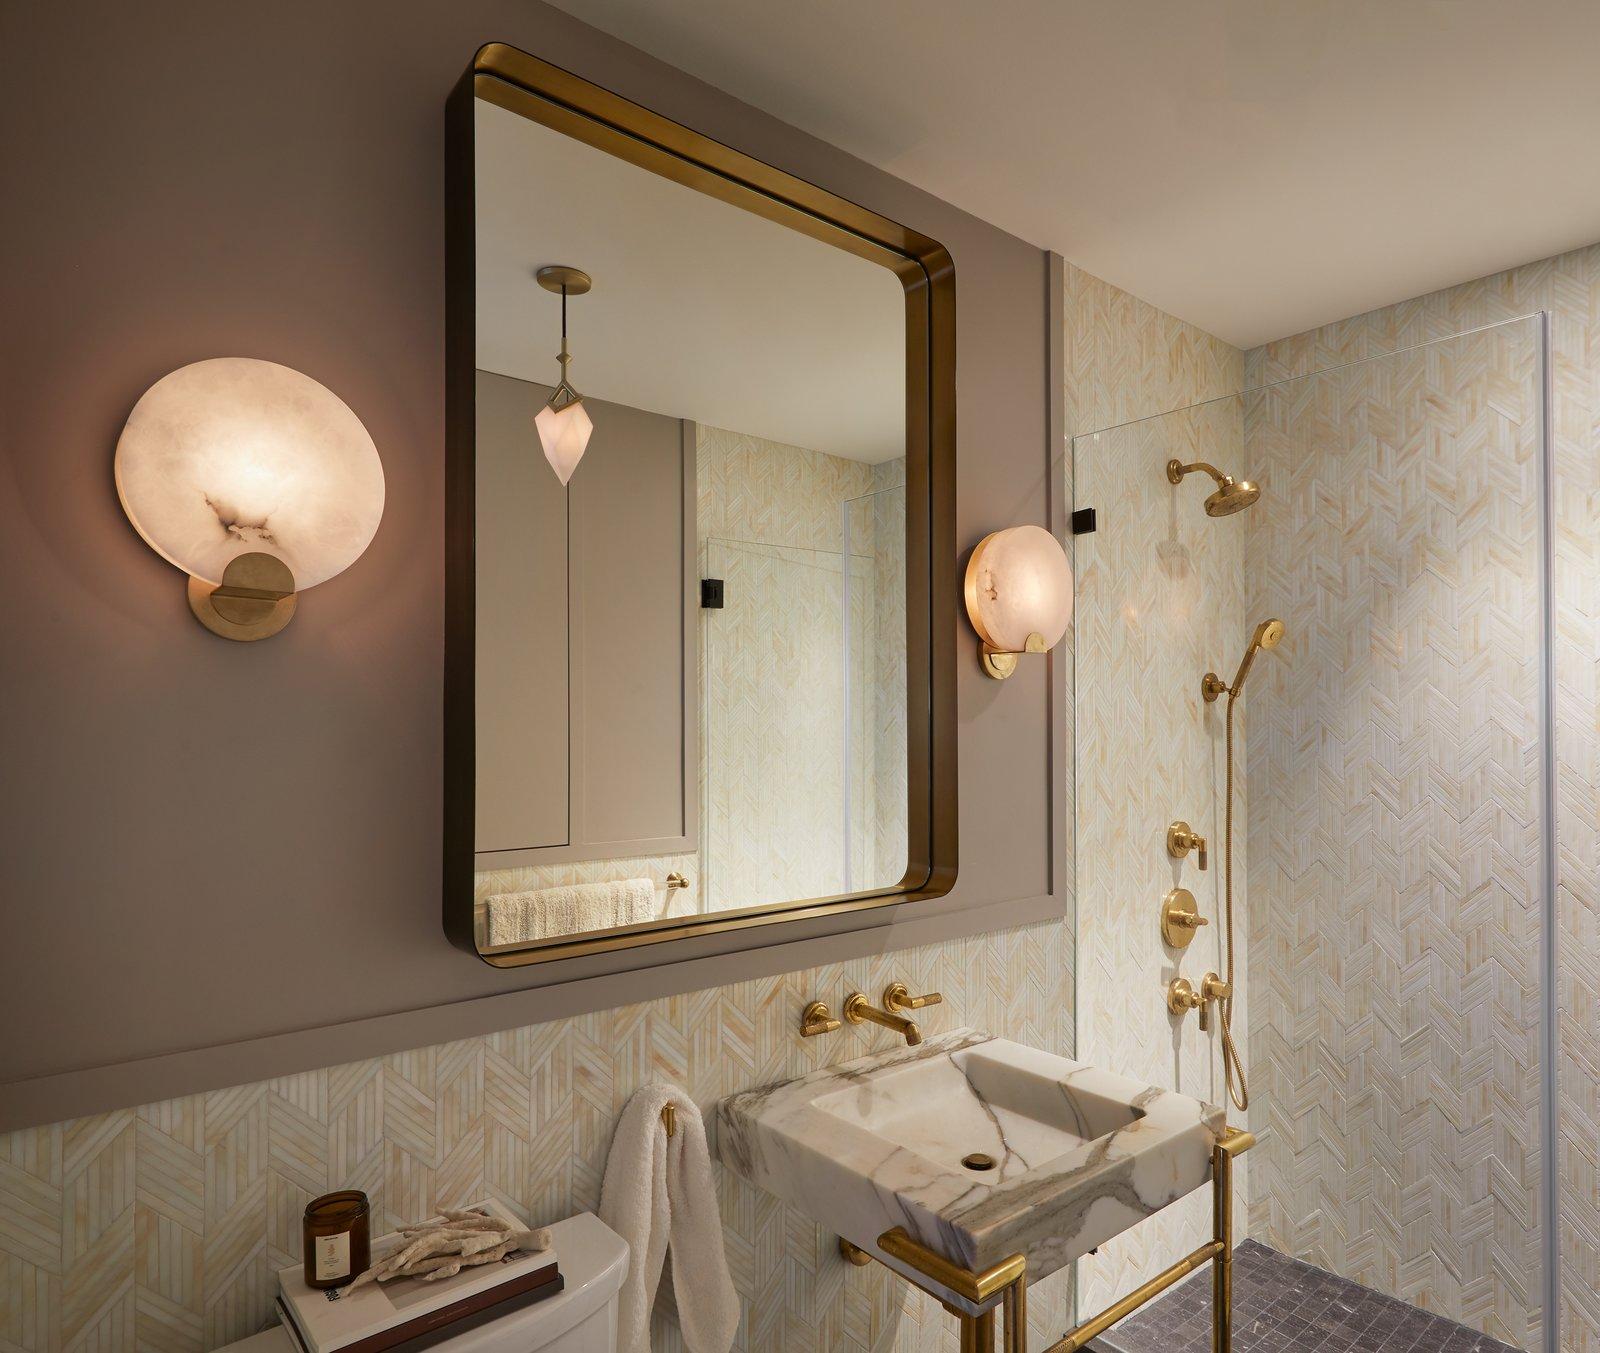 AFter: Brooklyn Art Deco Duplex bathroom